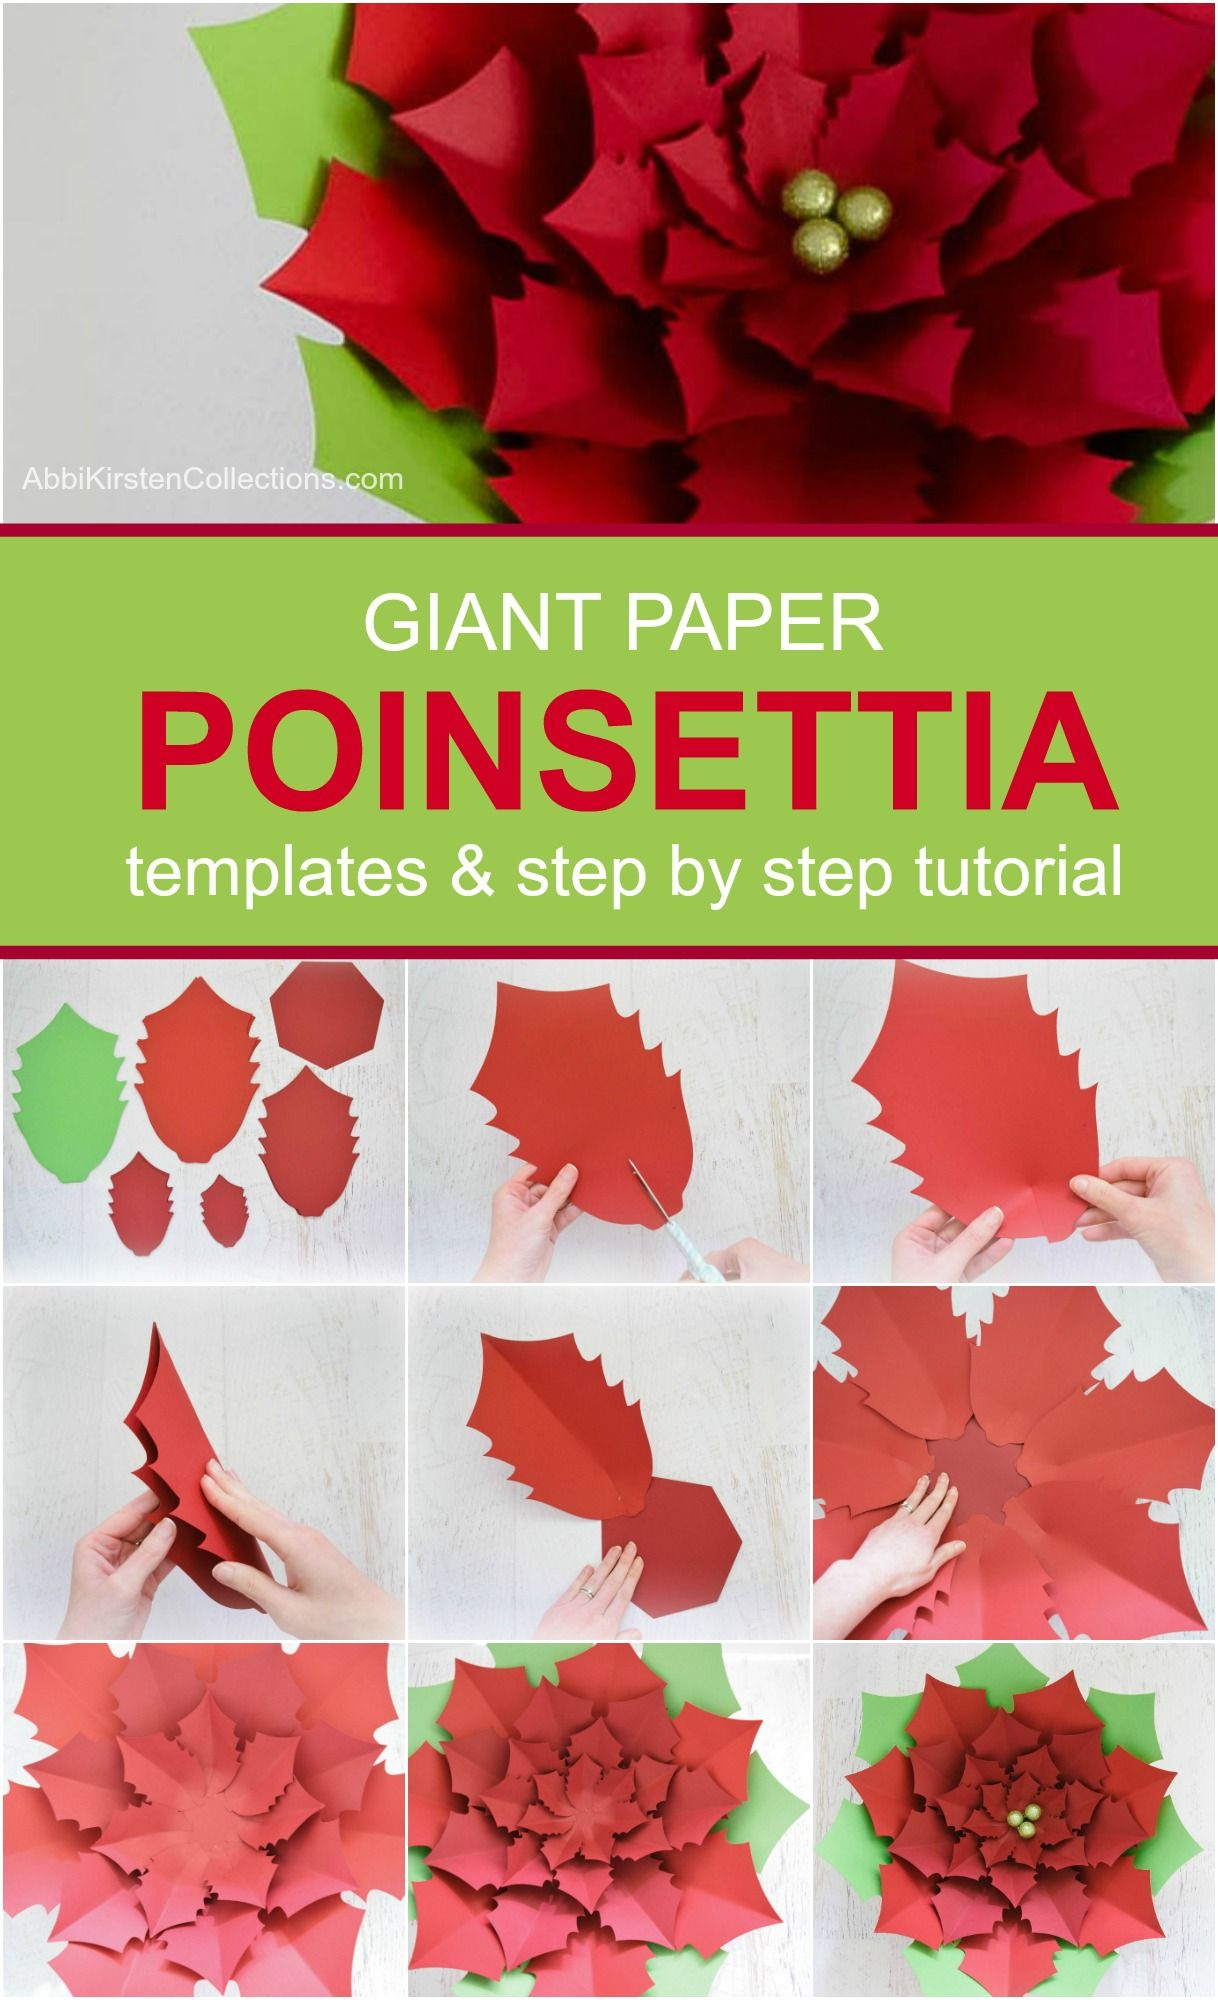 Diy Giant Paper Poinsettia Tutorial Christmas Paper Poinsettias Paper Christmas Decorations Christmas Paper Crafts Paper Crafts Diy